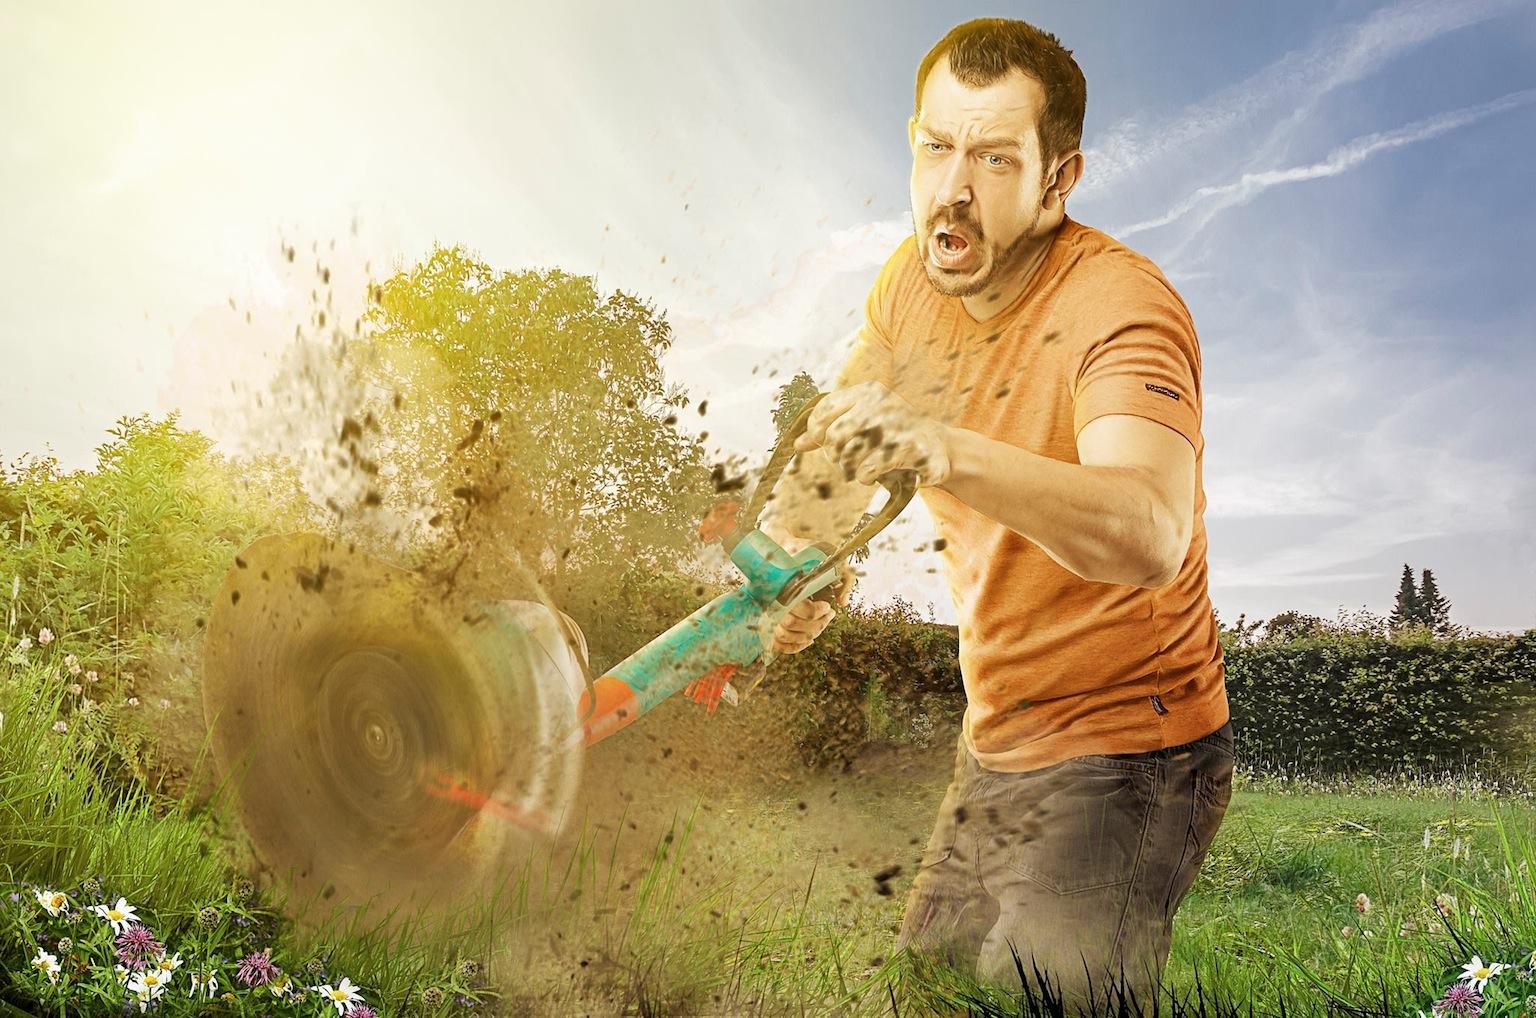 Action Gardening